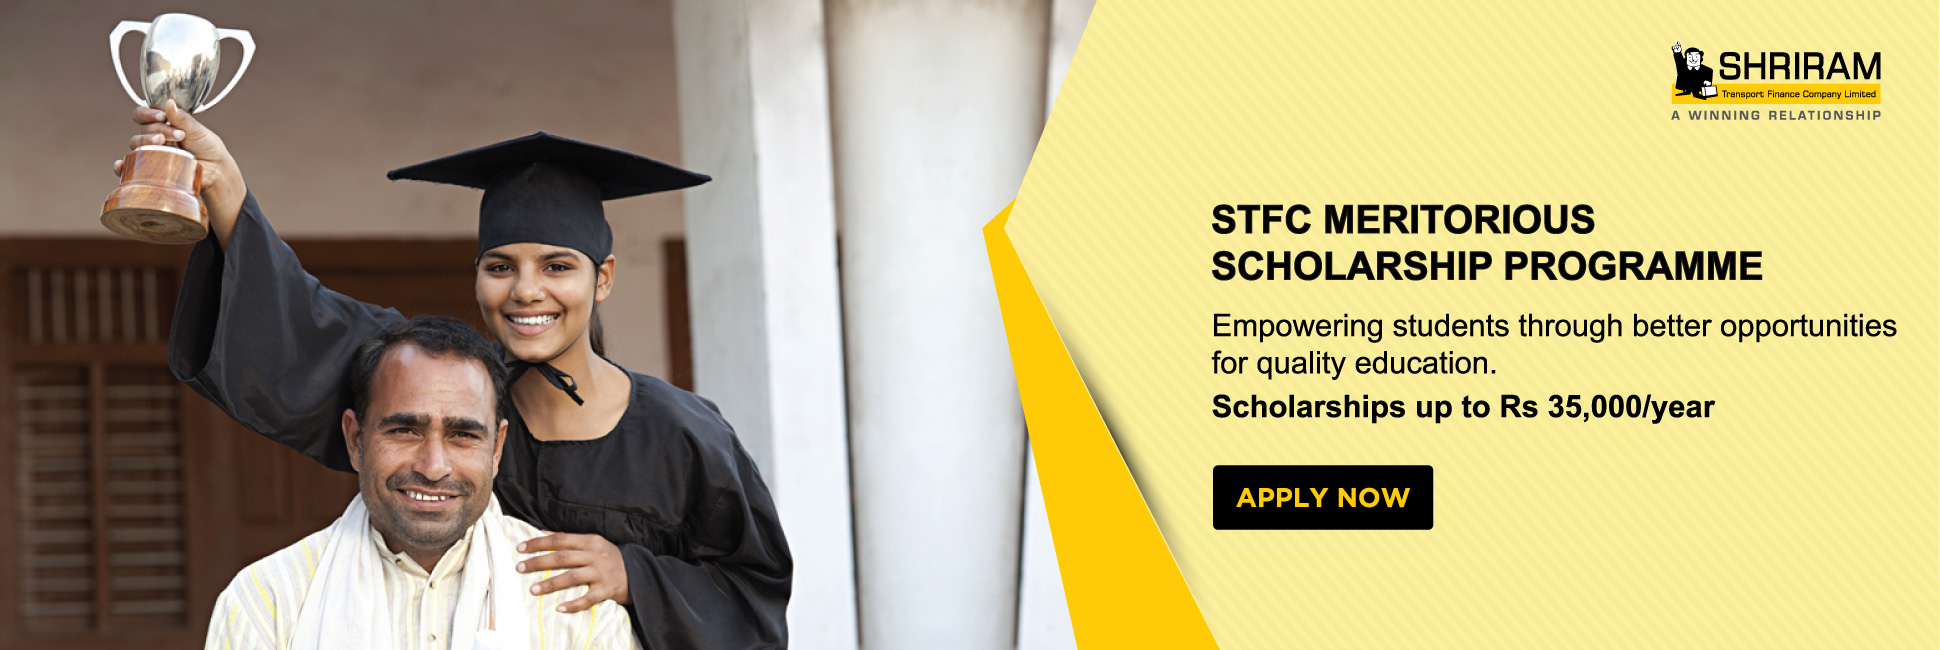 stfc scholarship